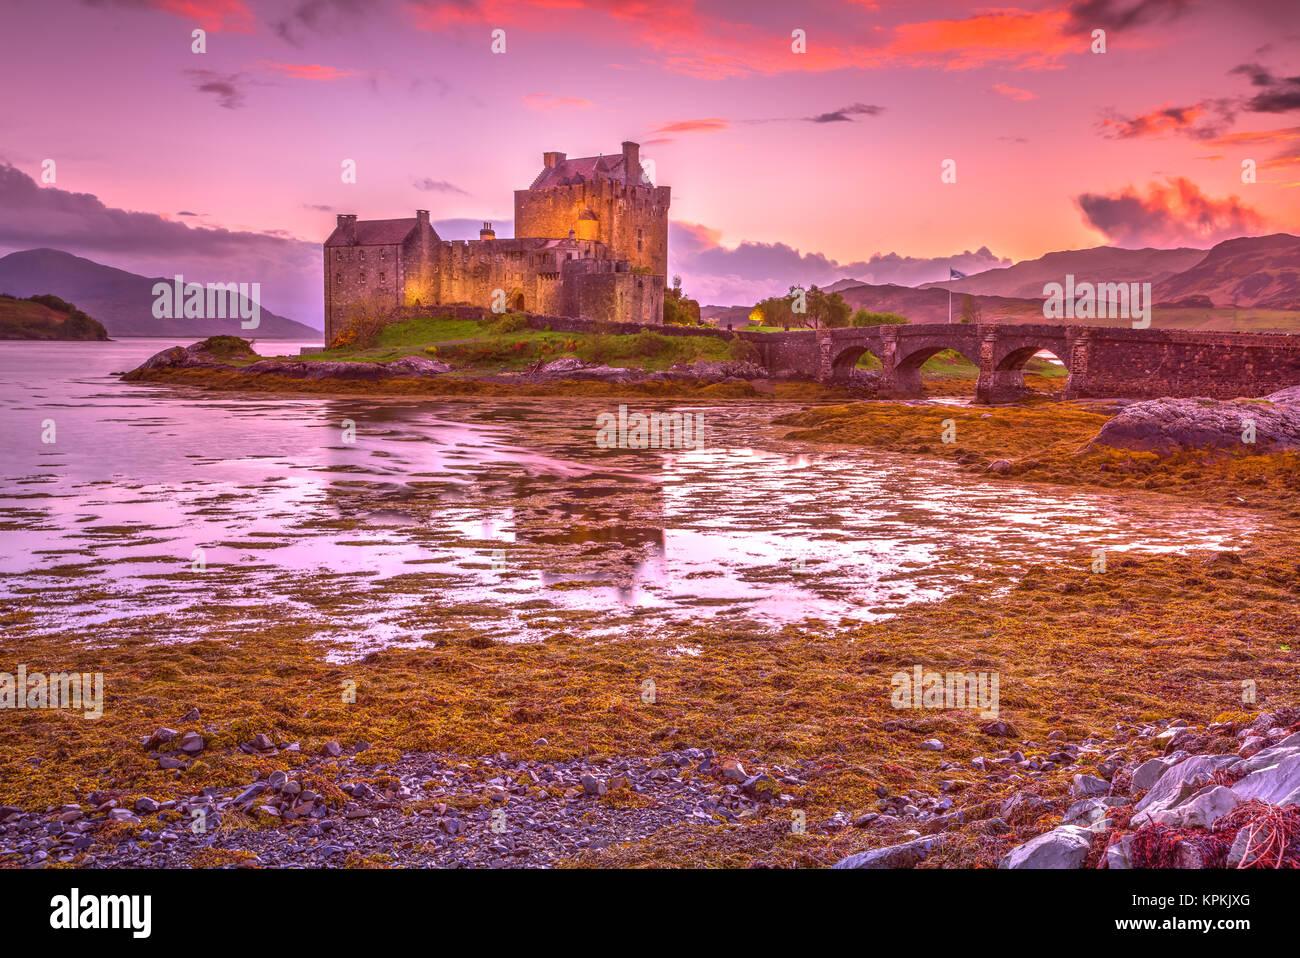 Magenta sunset at Eilean Donan Castle, Dornie, Kyle of Lochalsh in Scotland, United Kingdom. The most visited castle - Stock Image